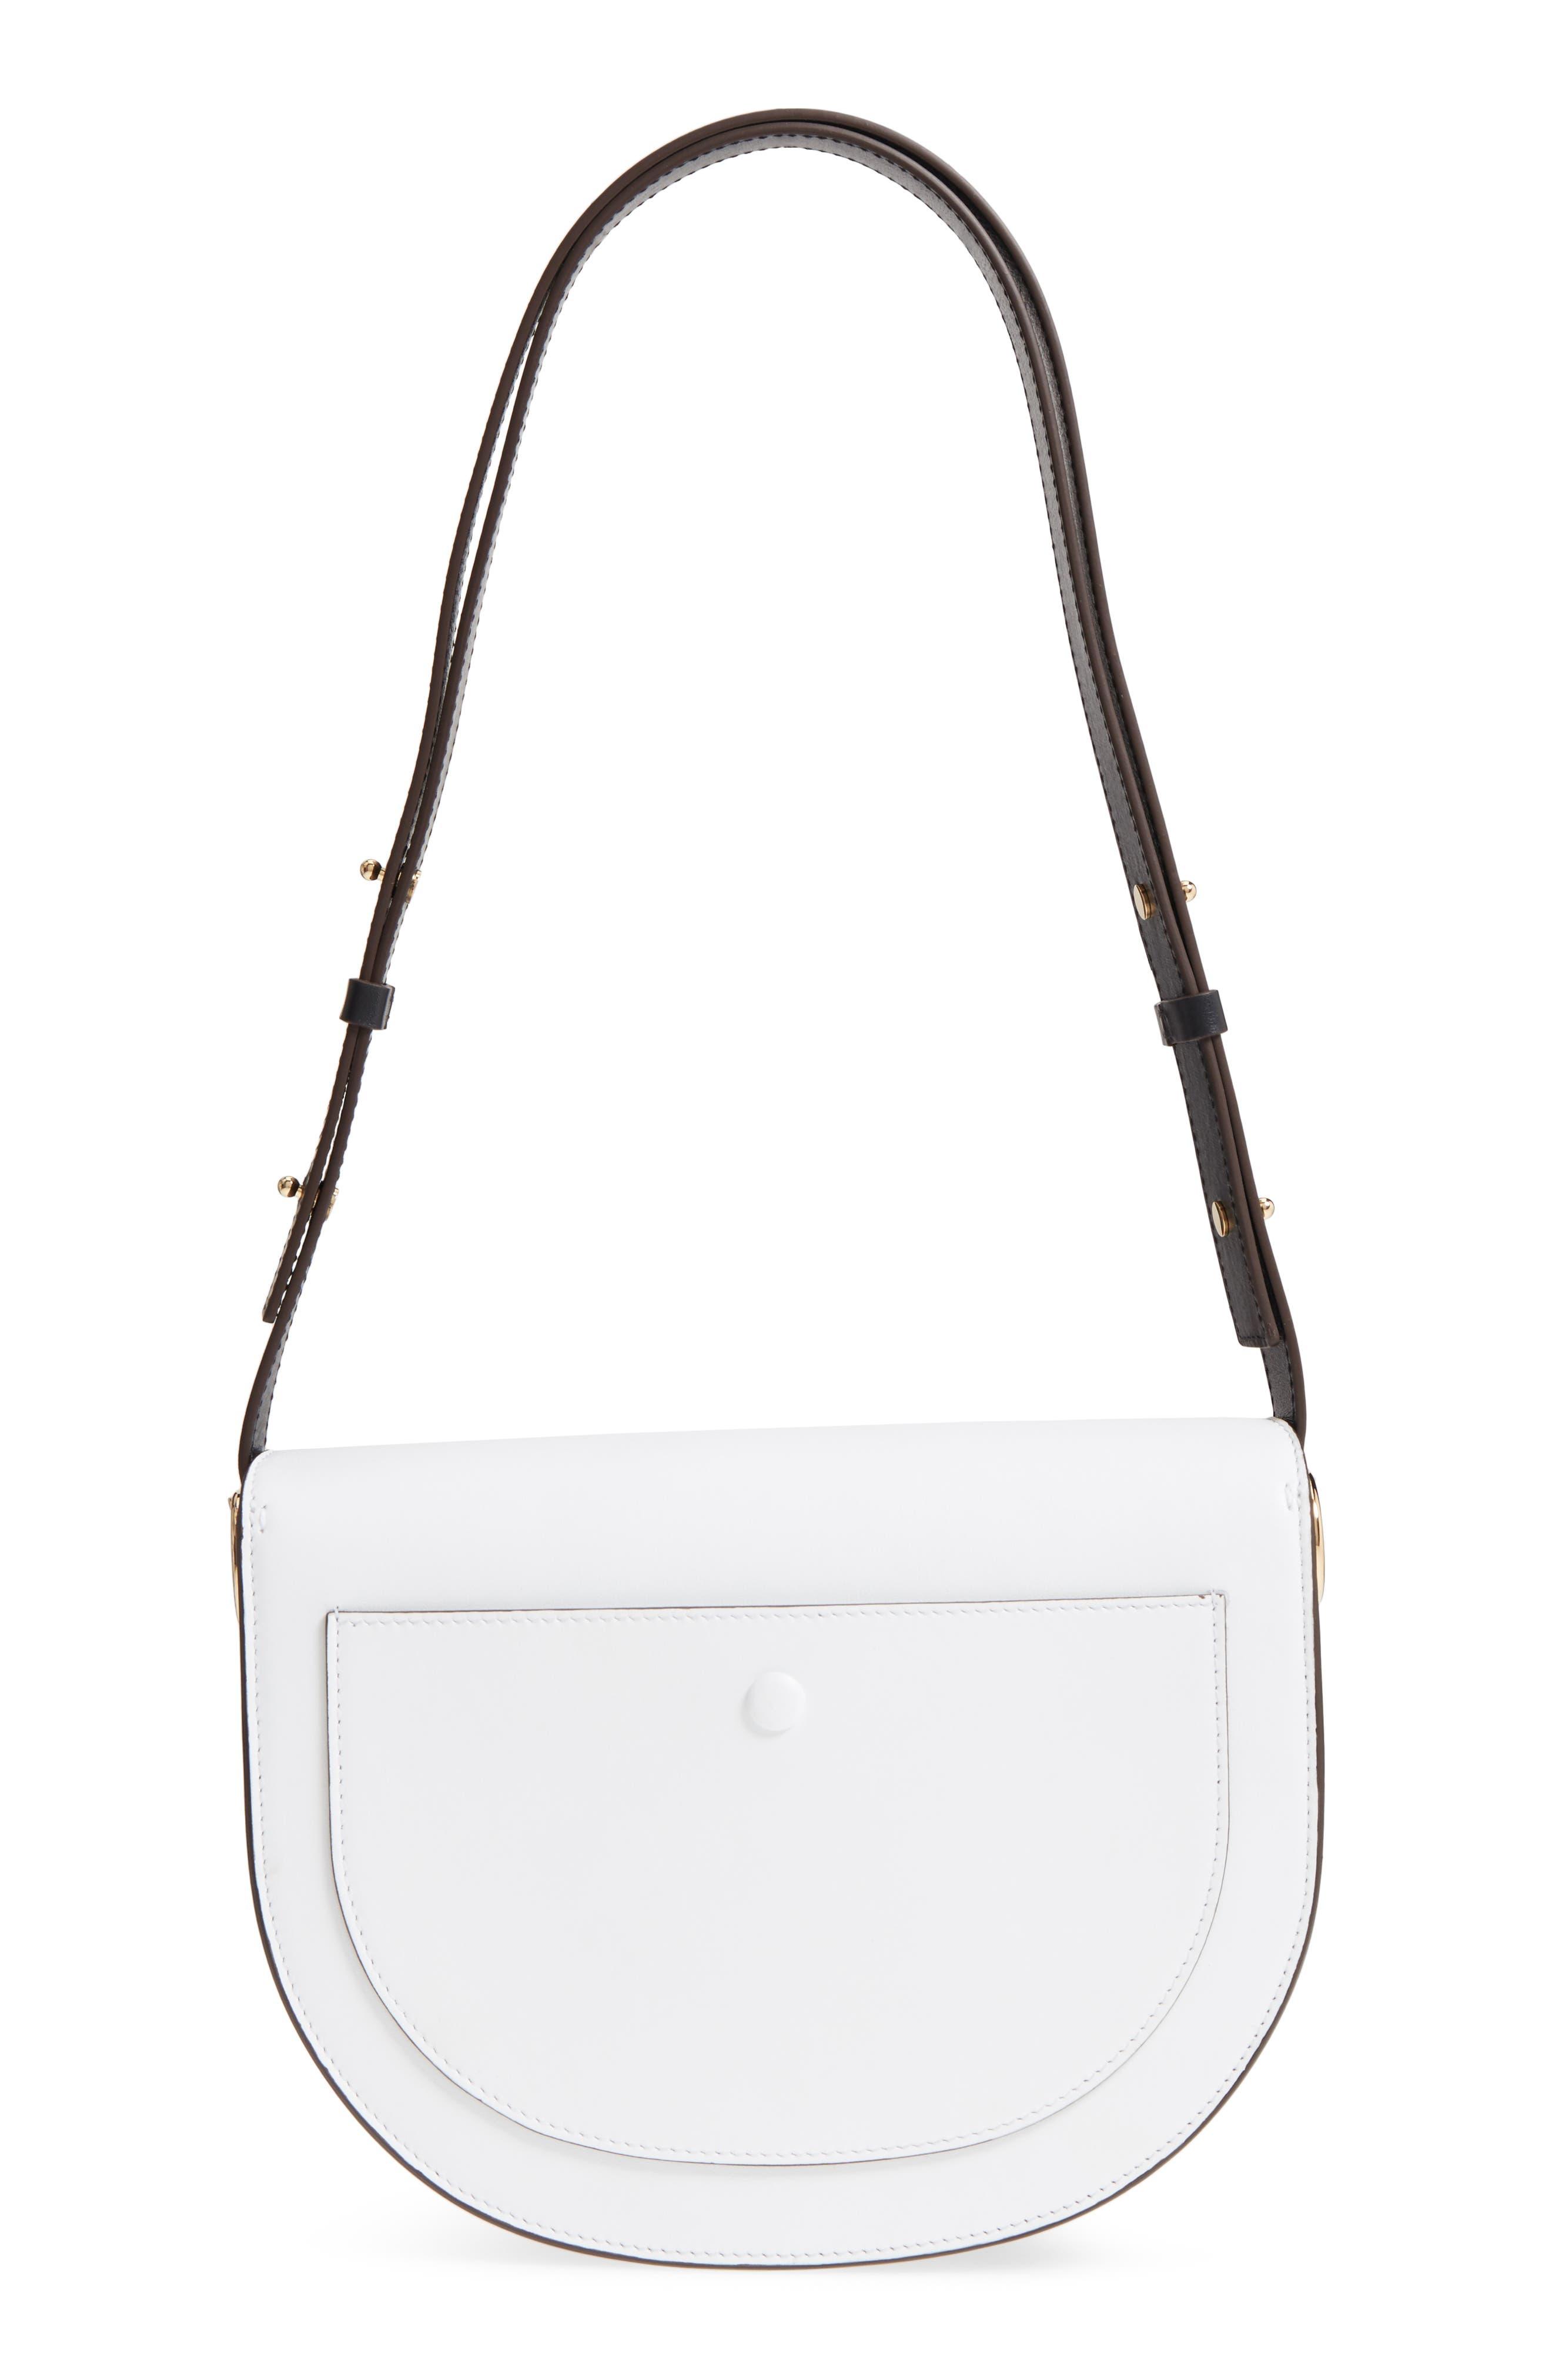 Half Moon Box Shoulder Bag,                             Alternate thumbnail 3, color,                             White/ Ambra/ Black